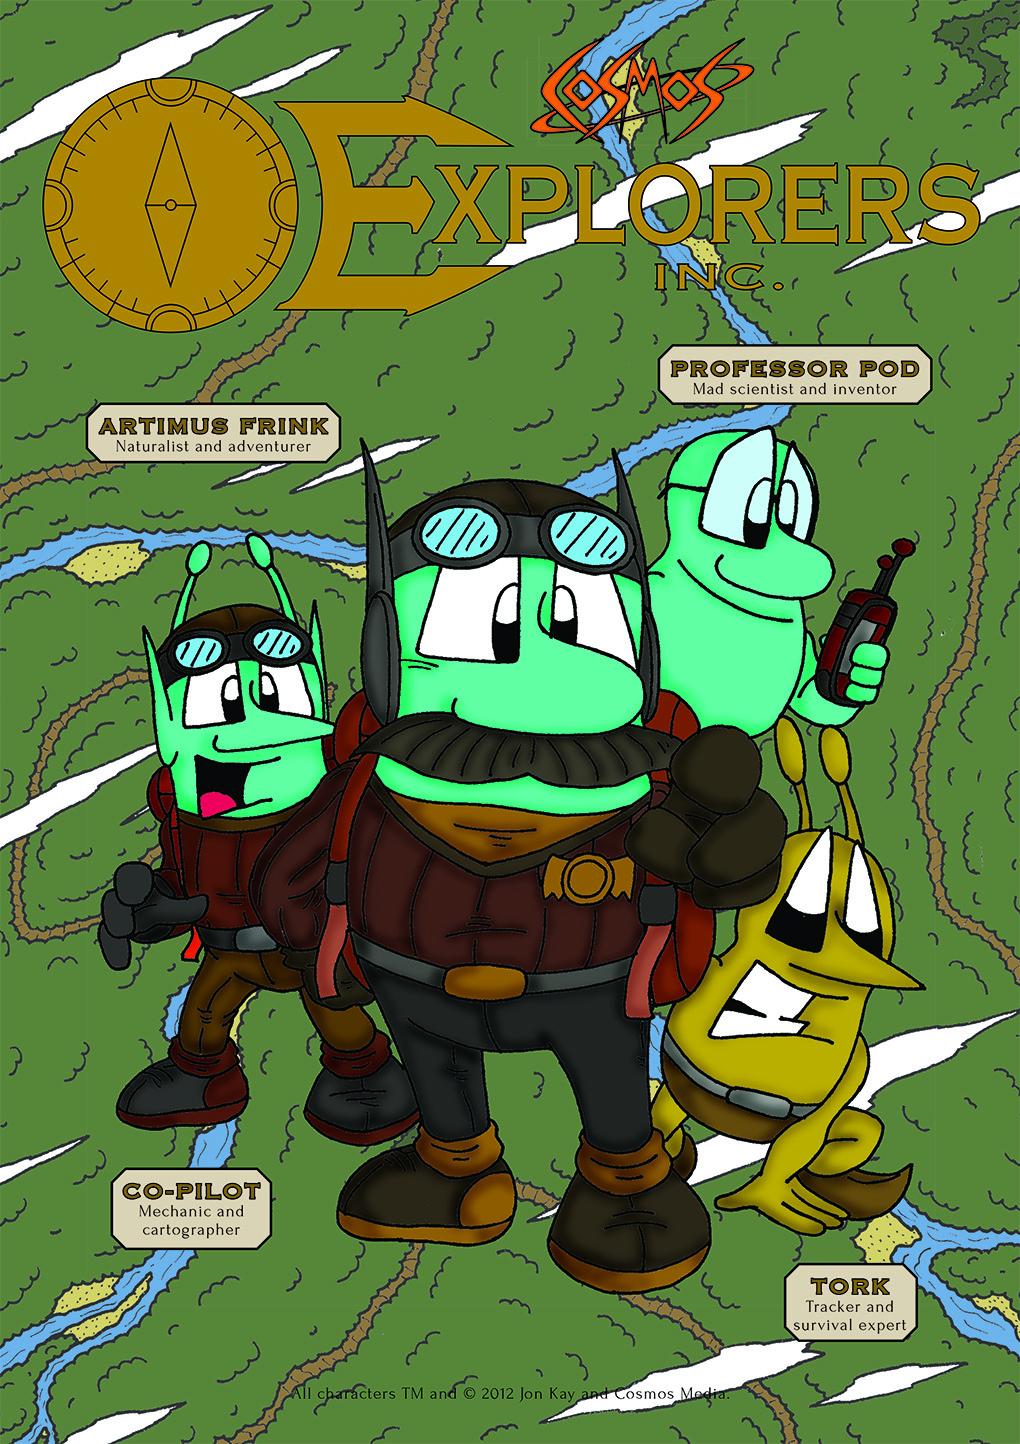 Explorers Inc Adventure Pack poster